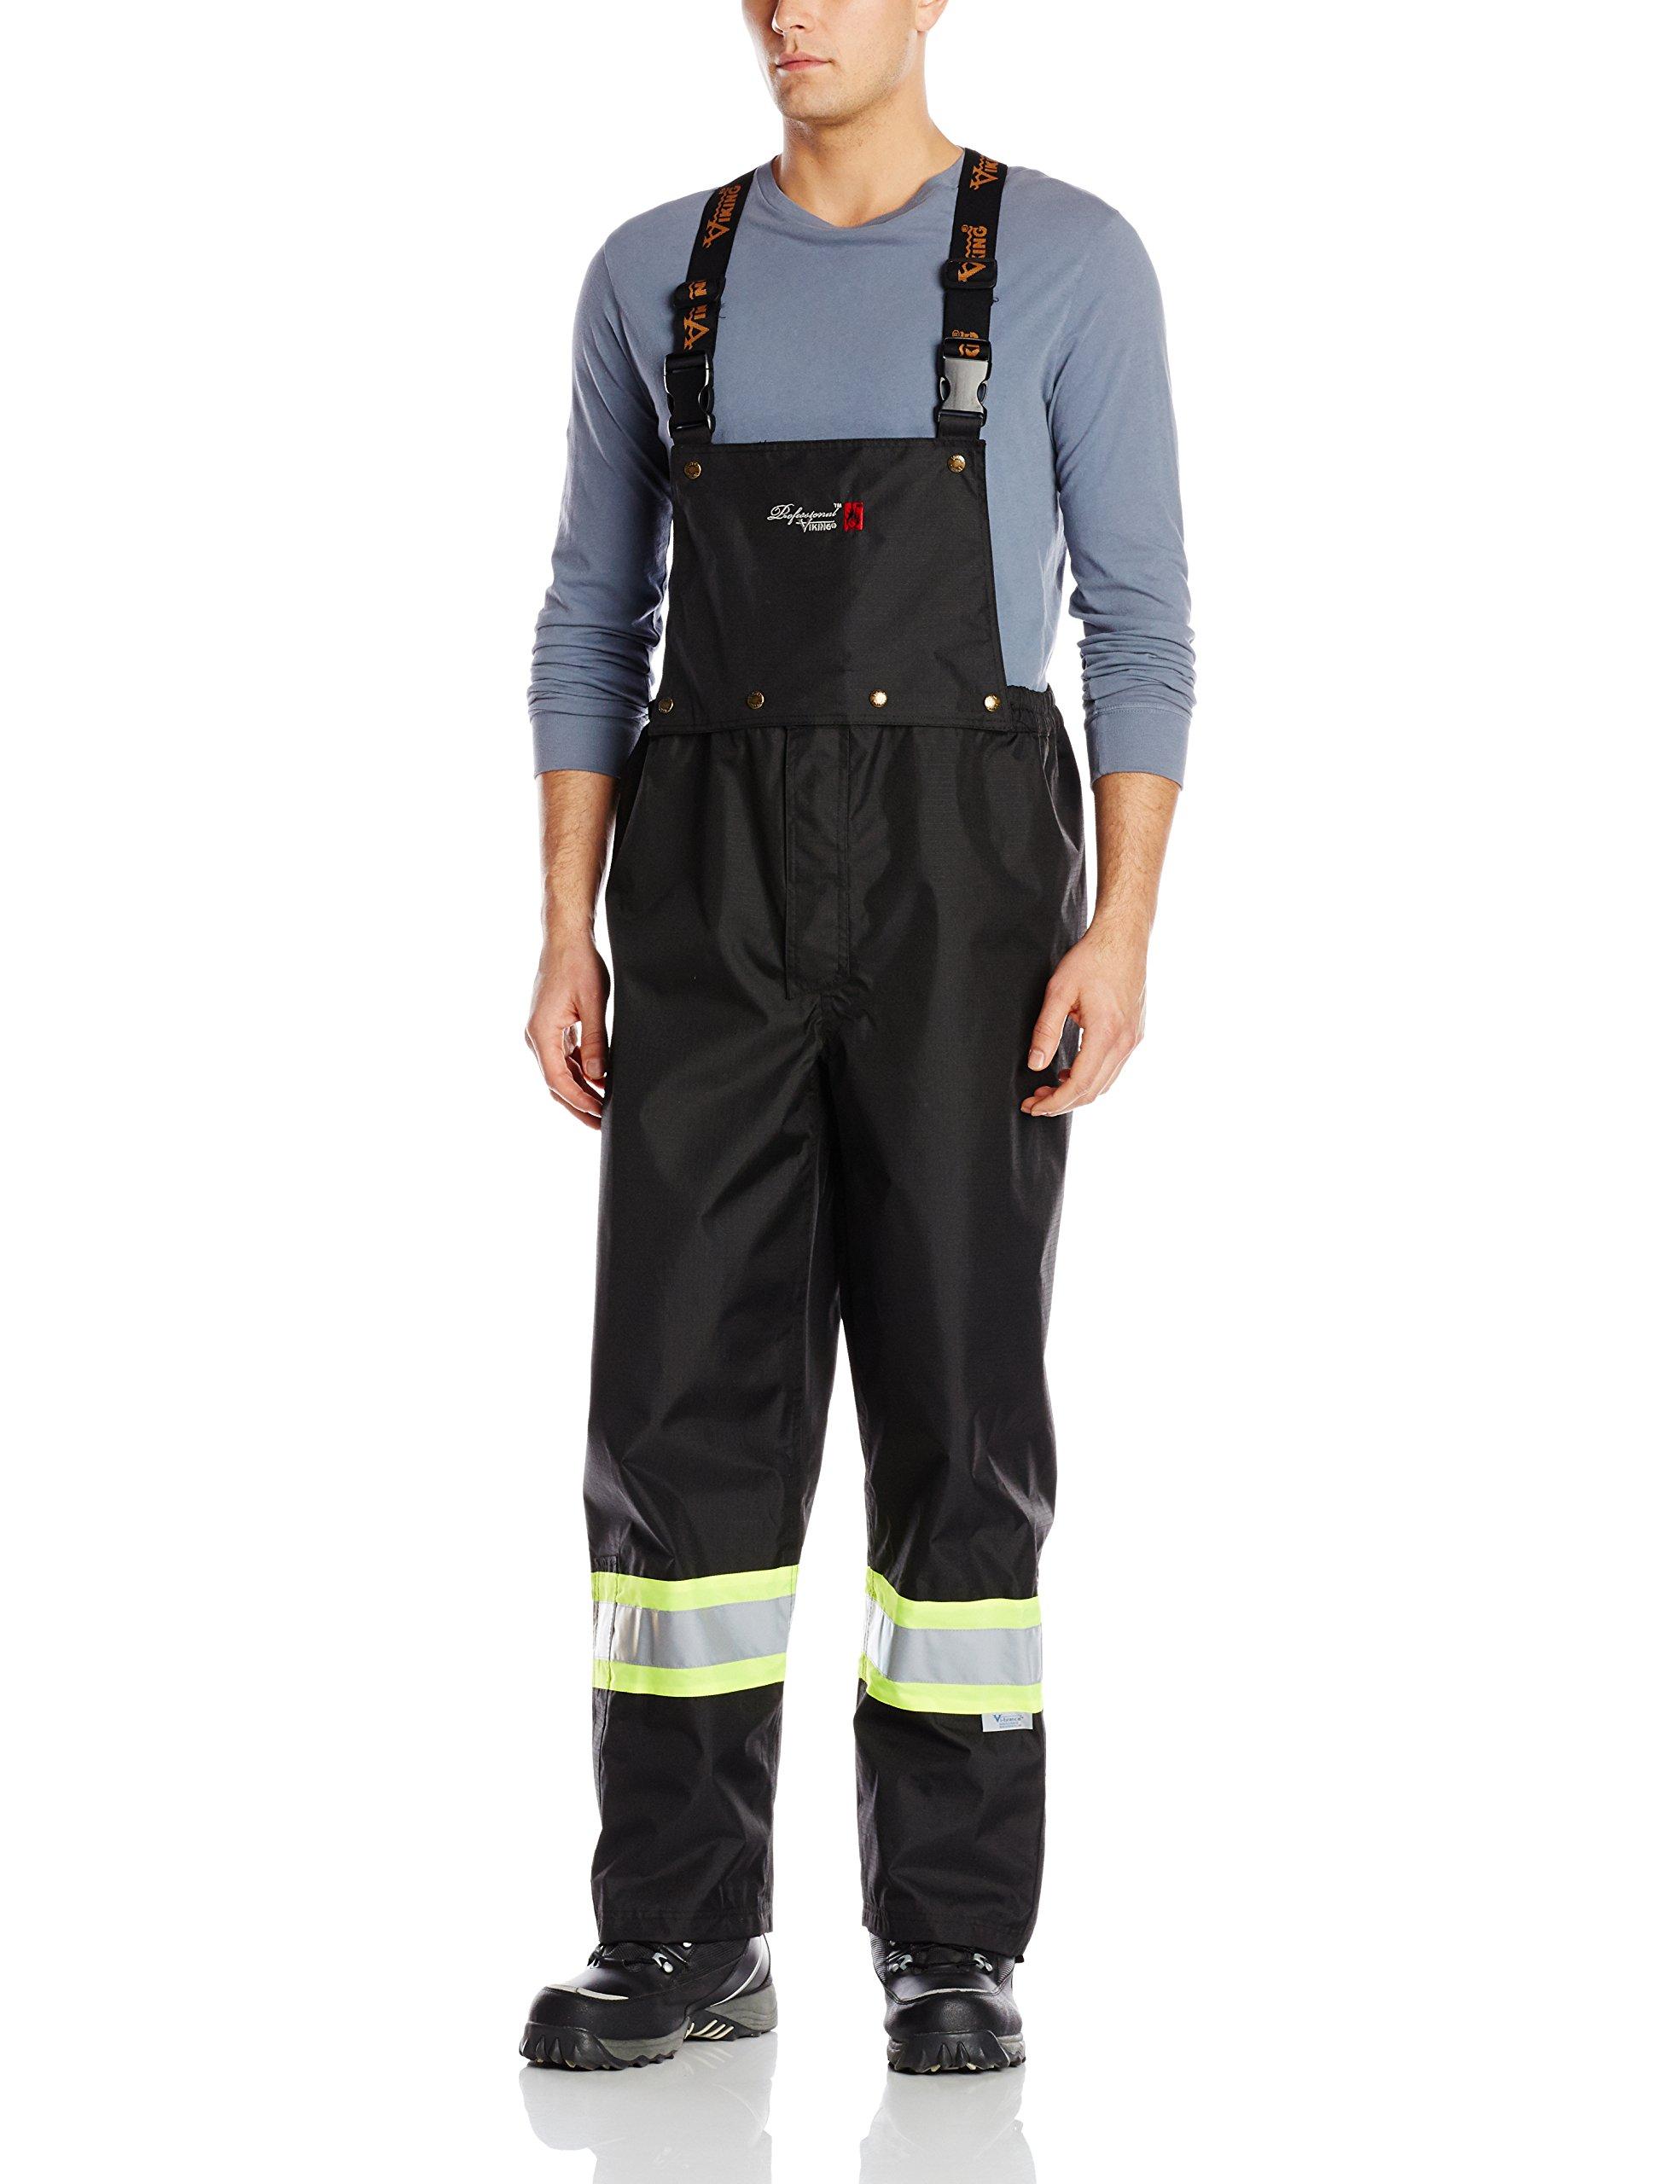 Viking Professional Journeyman FR Waterproof Flame Resistant Bib Pant, Black, Large